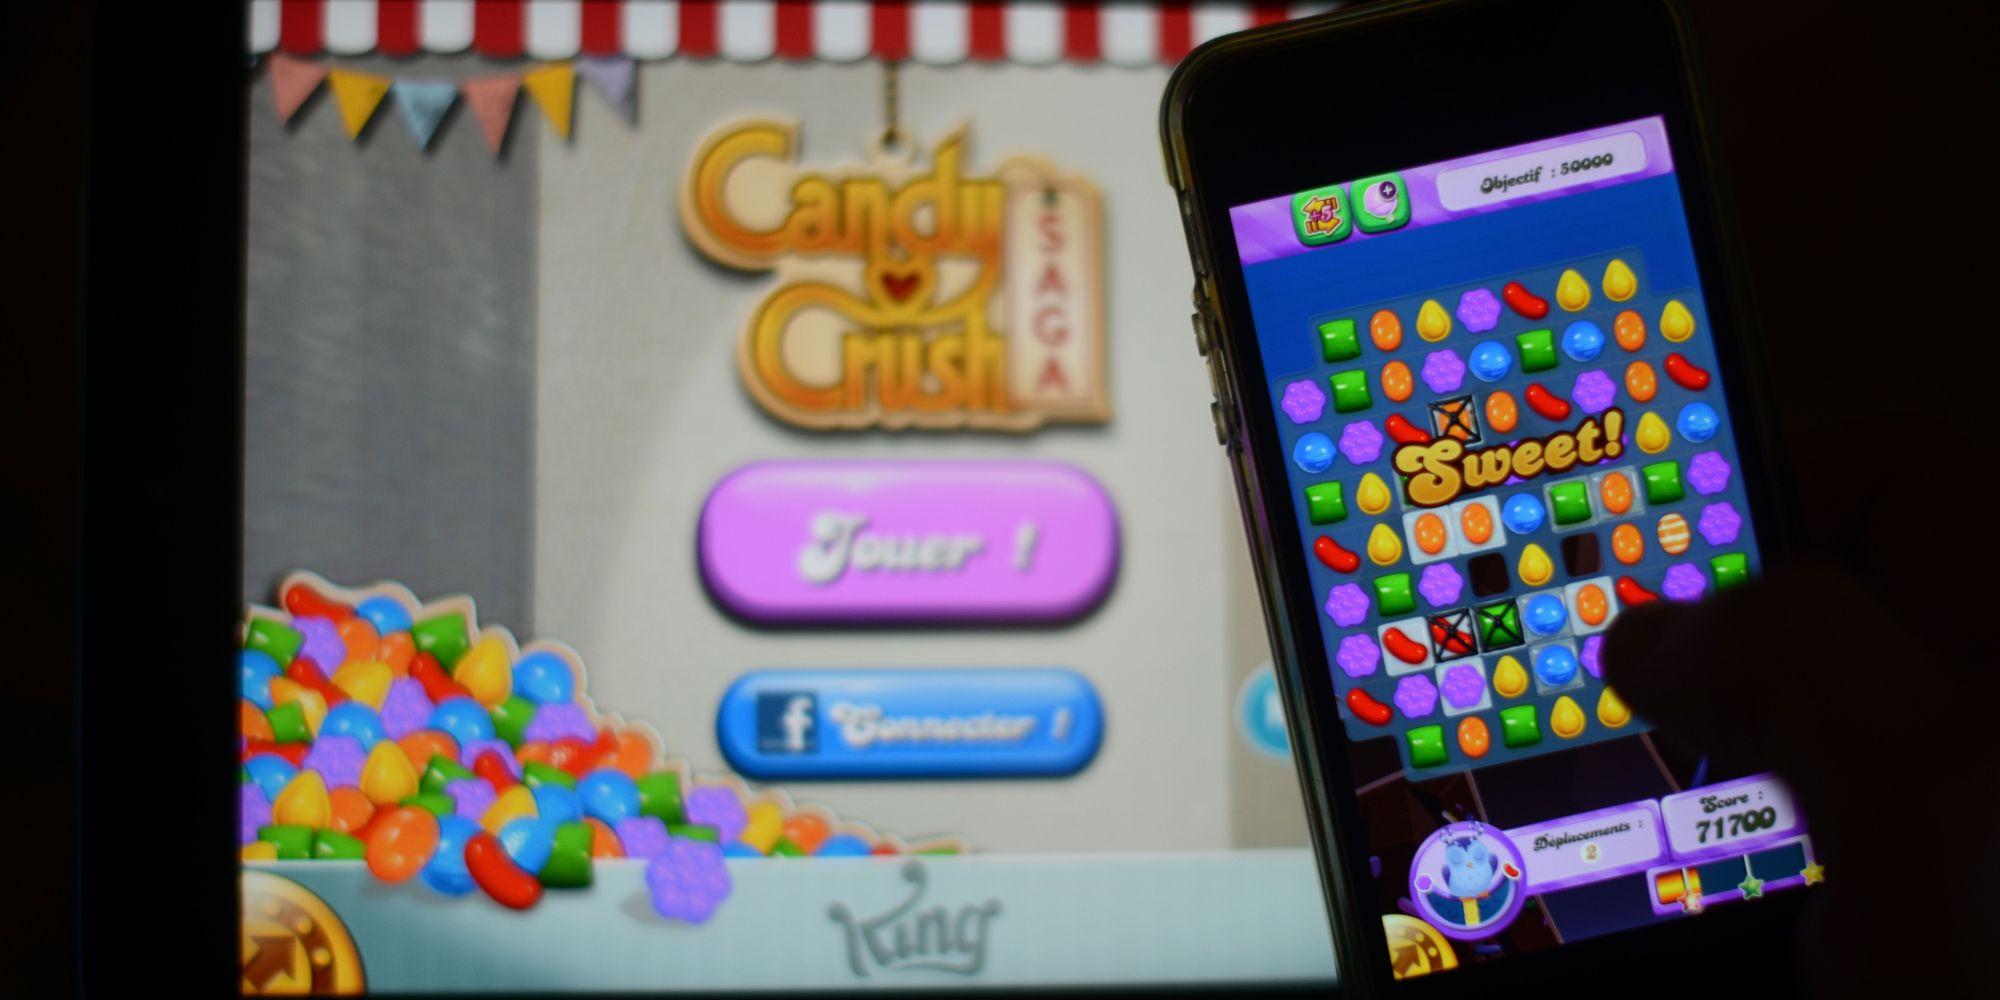 Candy Crush Addiction Center